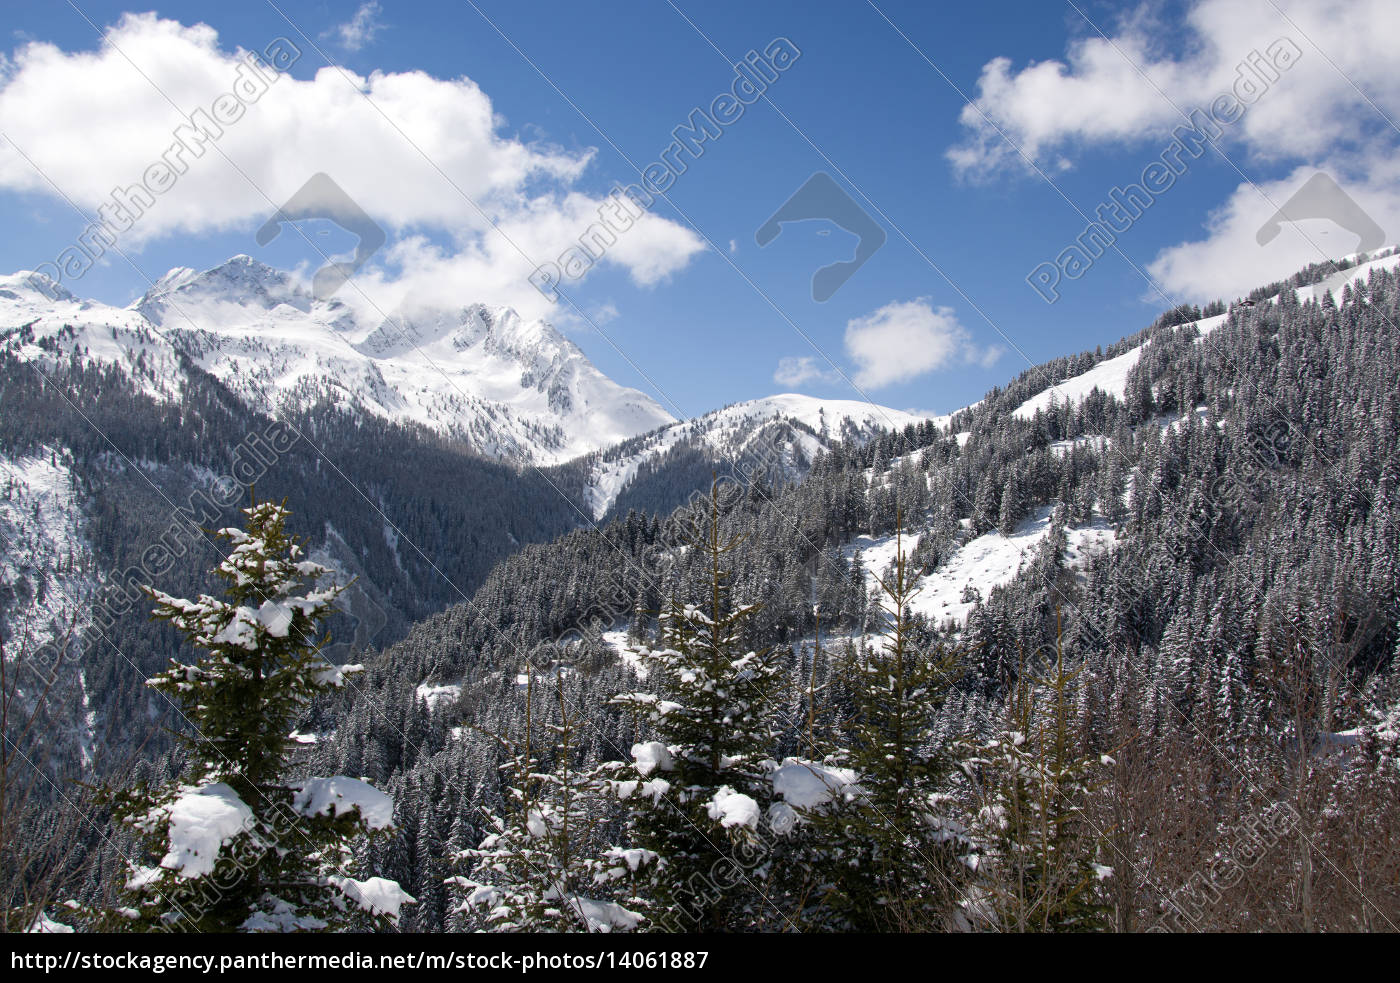 pinzgau, austria - 14061887